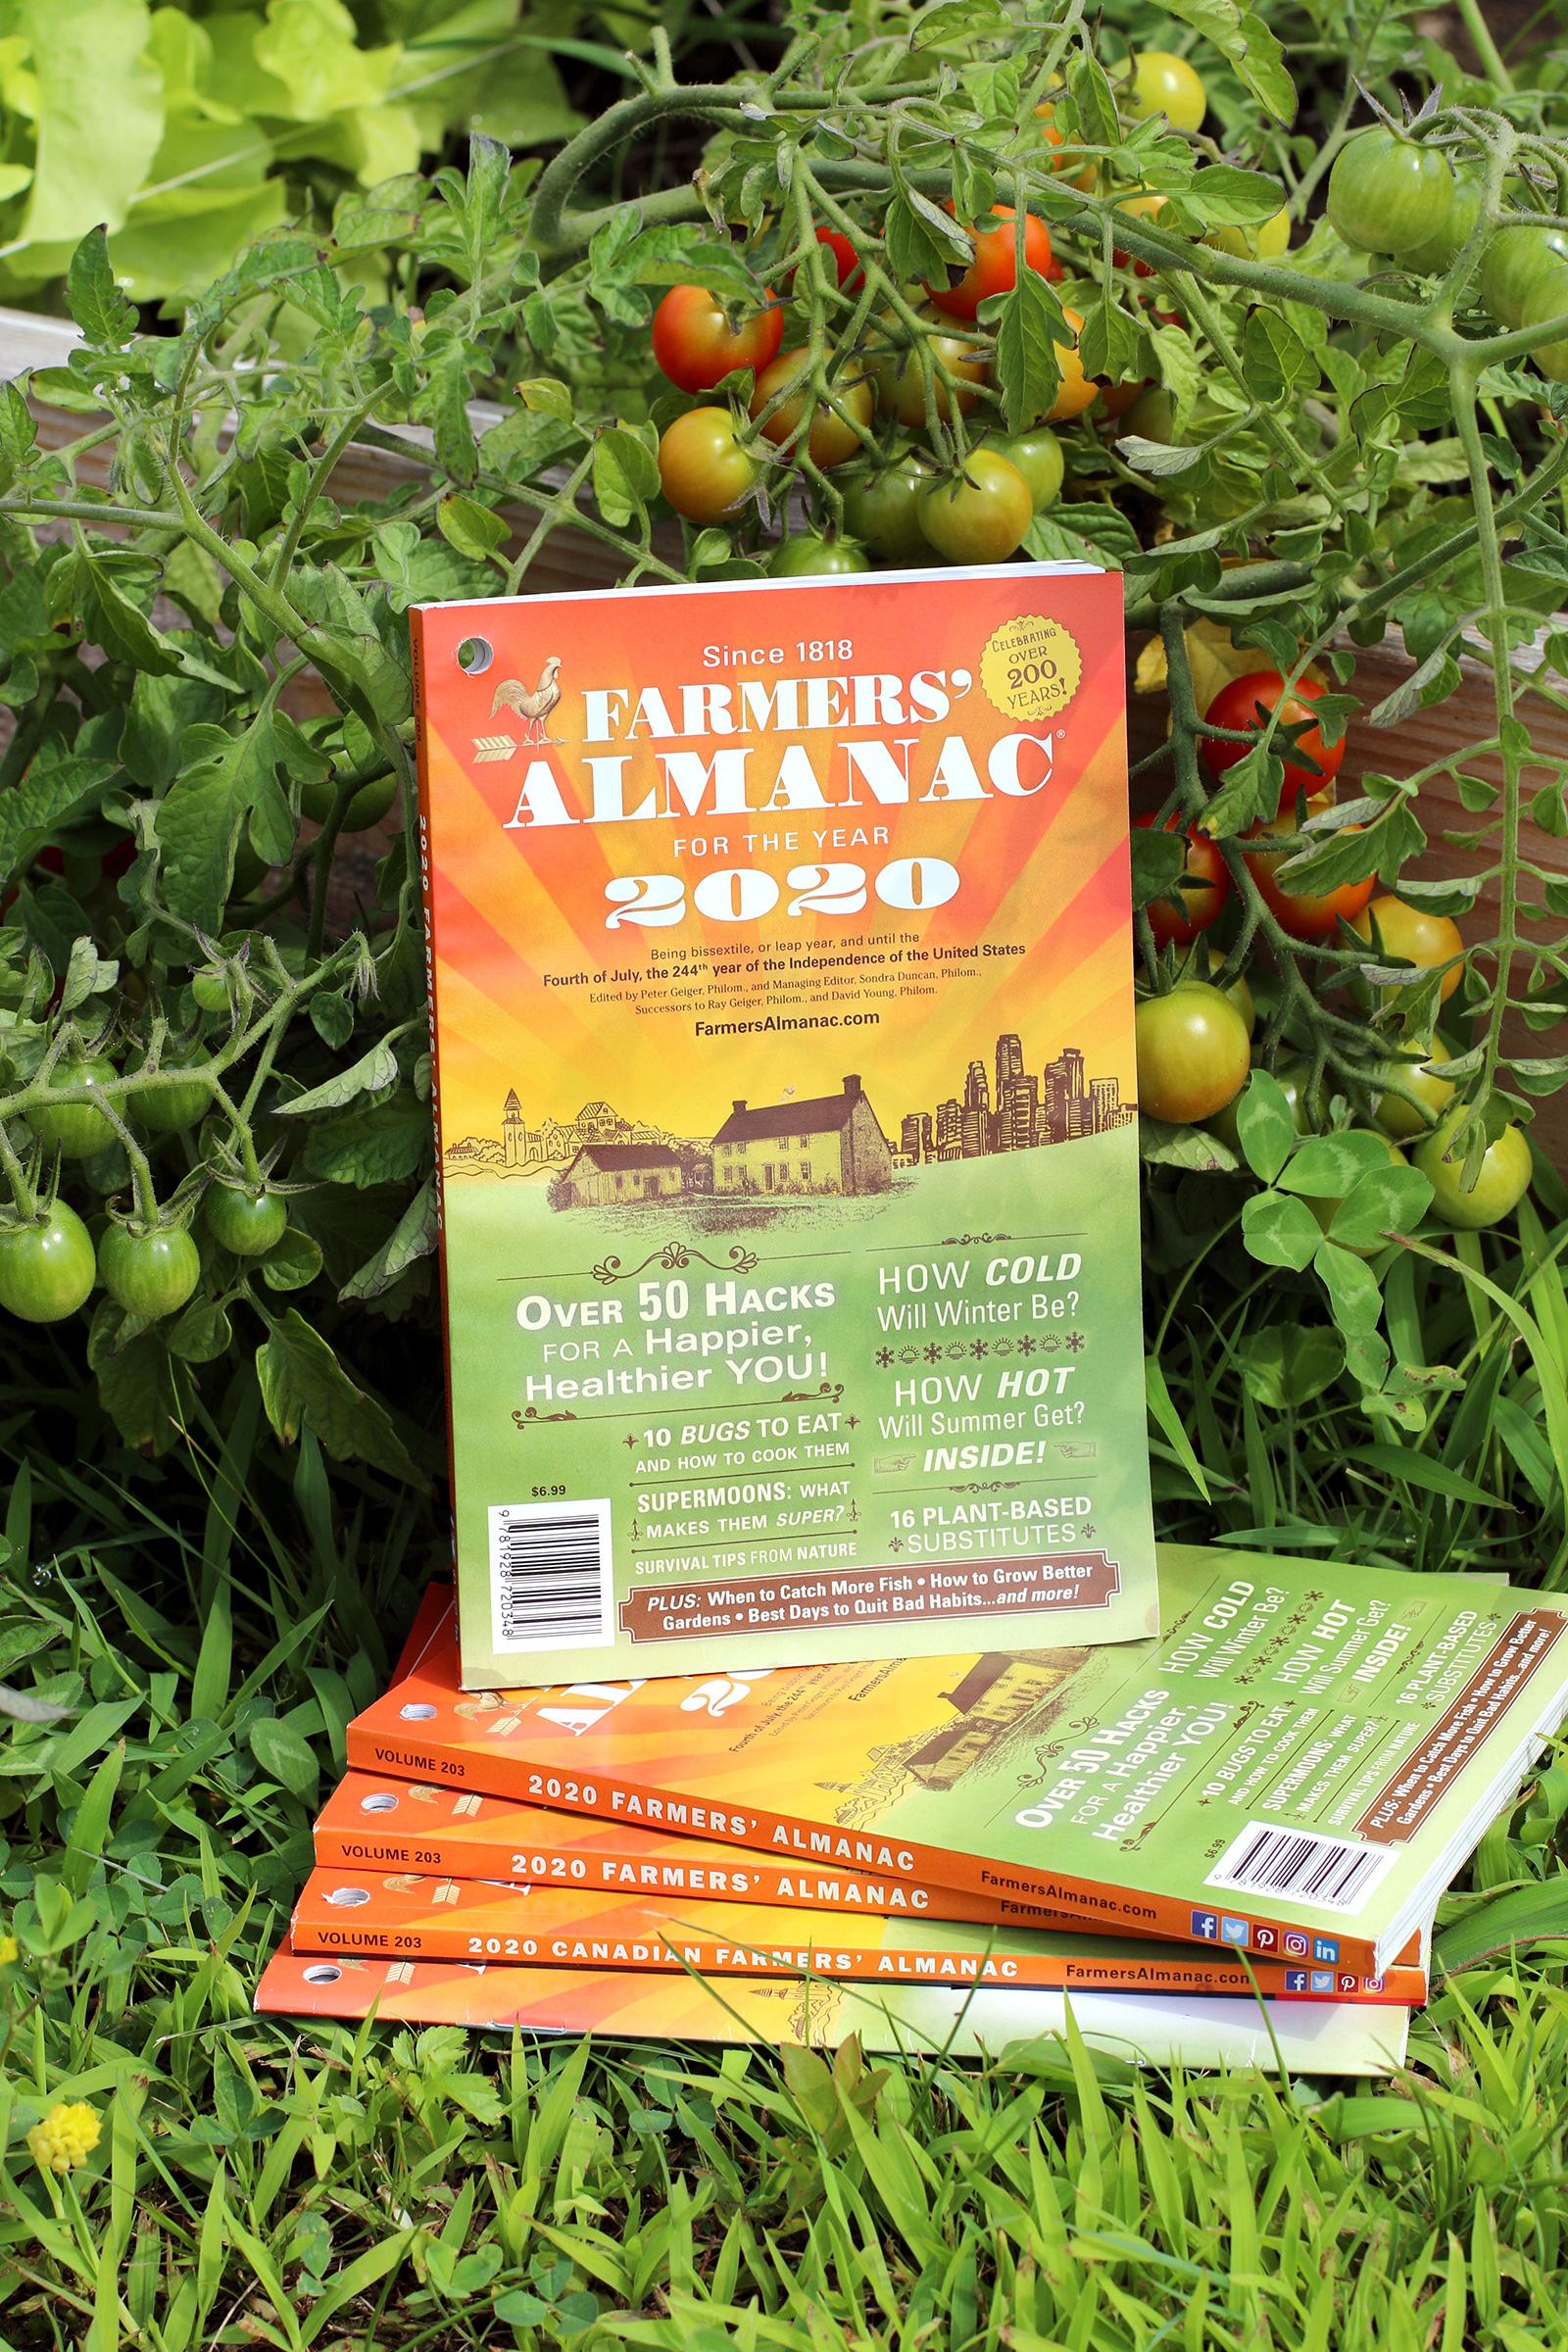 What's Inside The 2020 Farmers' Almanac - Farmers' Almanac